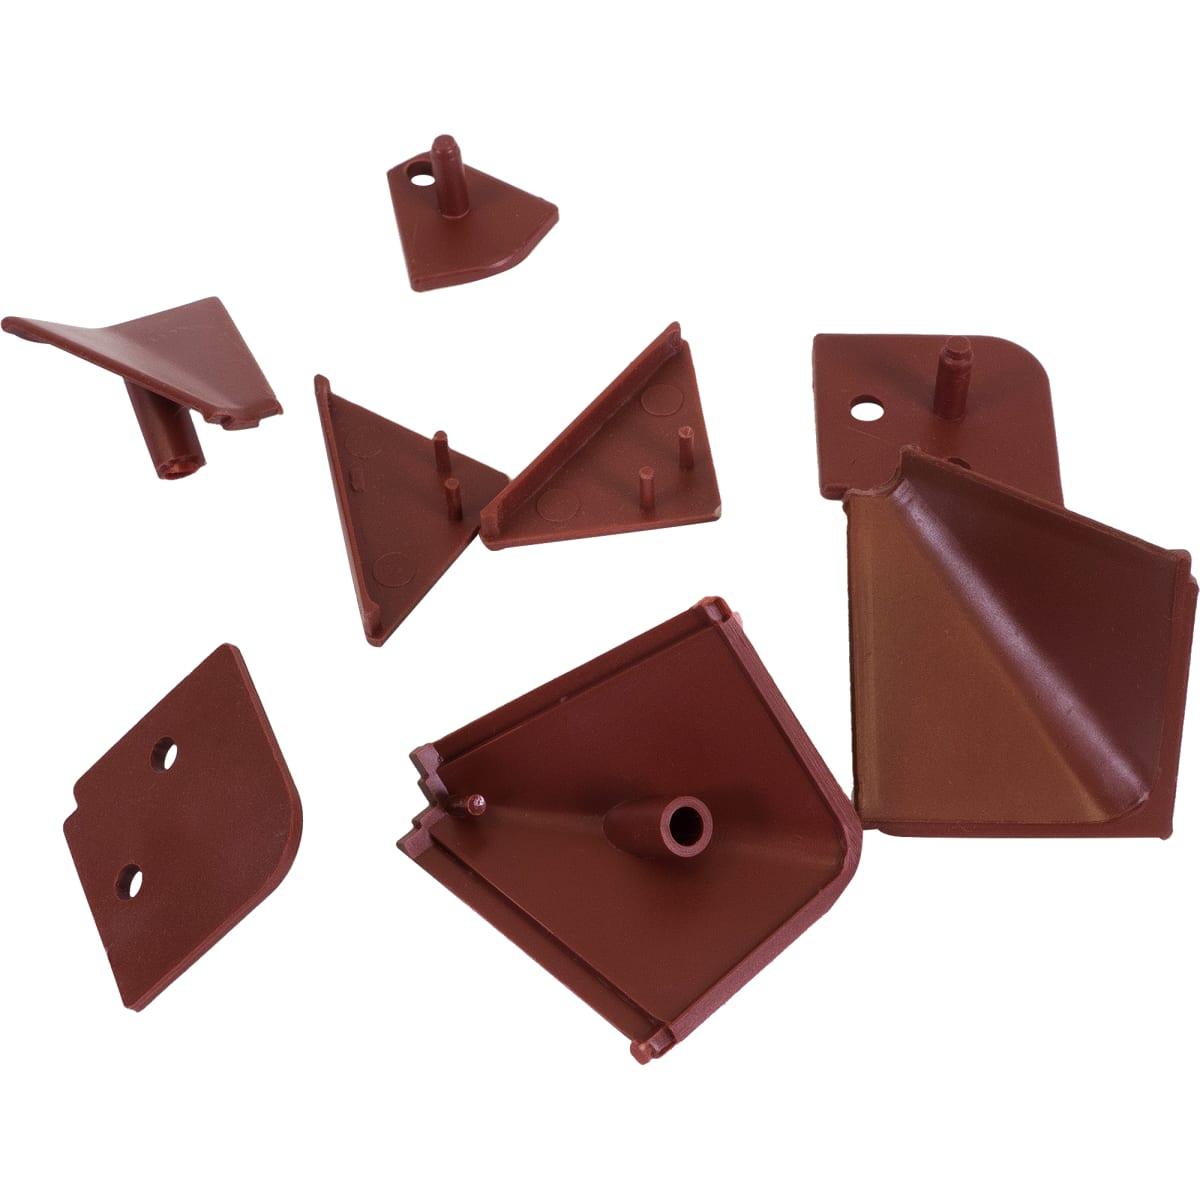 Заглушки к плинтусу 4х5 см цвет коричневый, 6 шт.